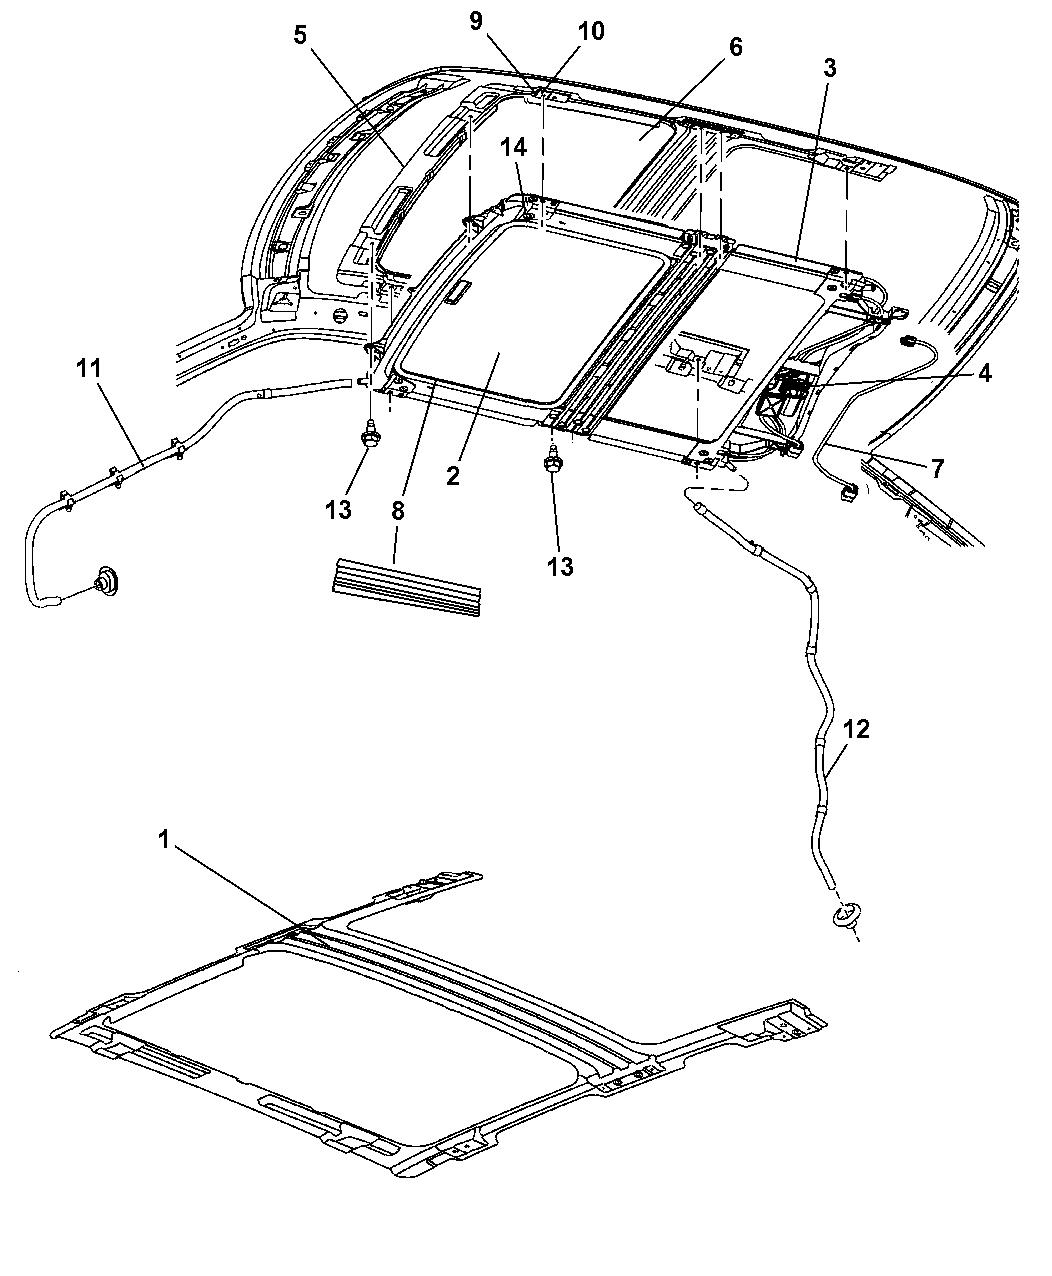 2006 Jeep Grand Cherokee Sunroof - Mopar Parts Giant Jeep Grand Cherokee Parts Diagram Schematic on